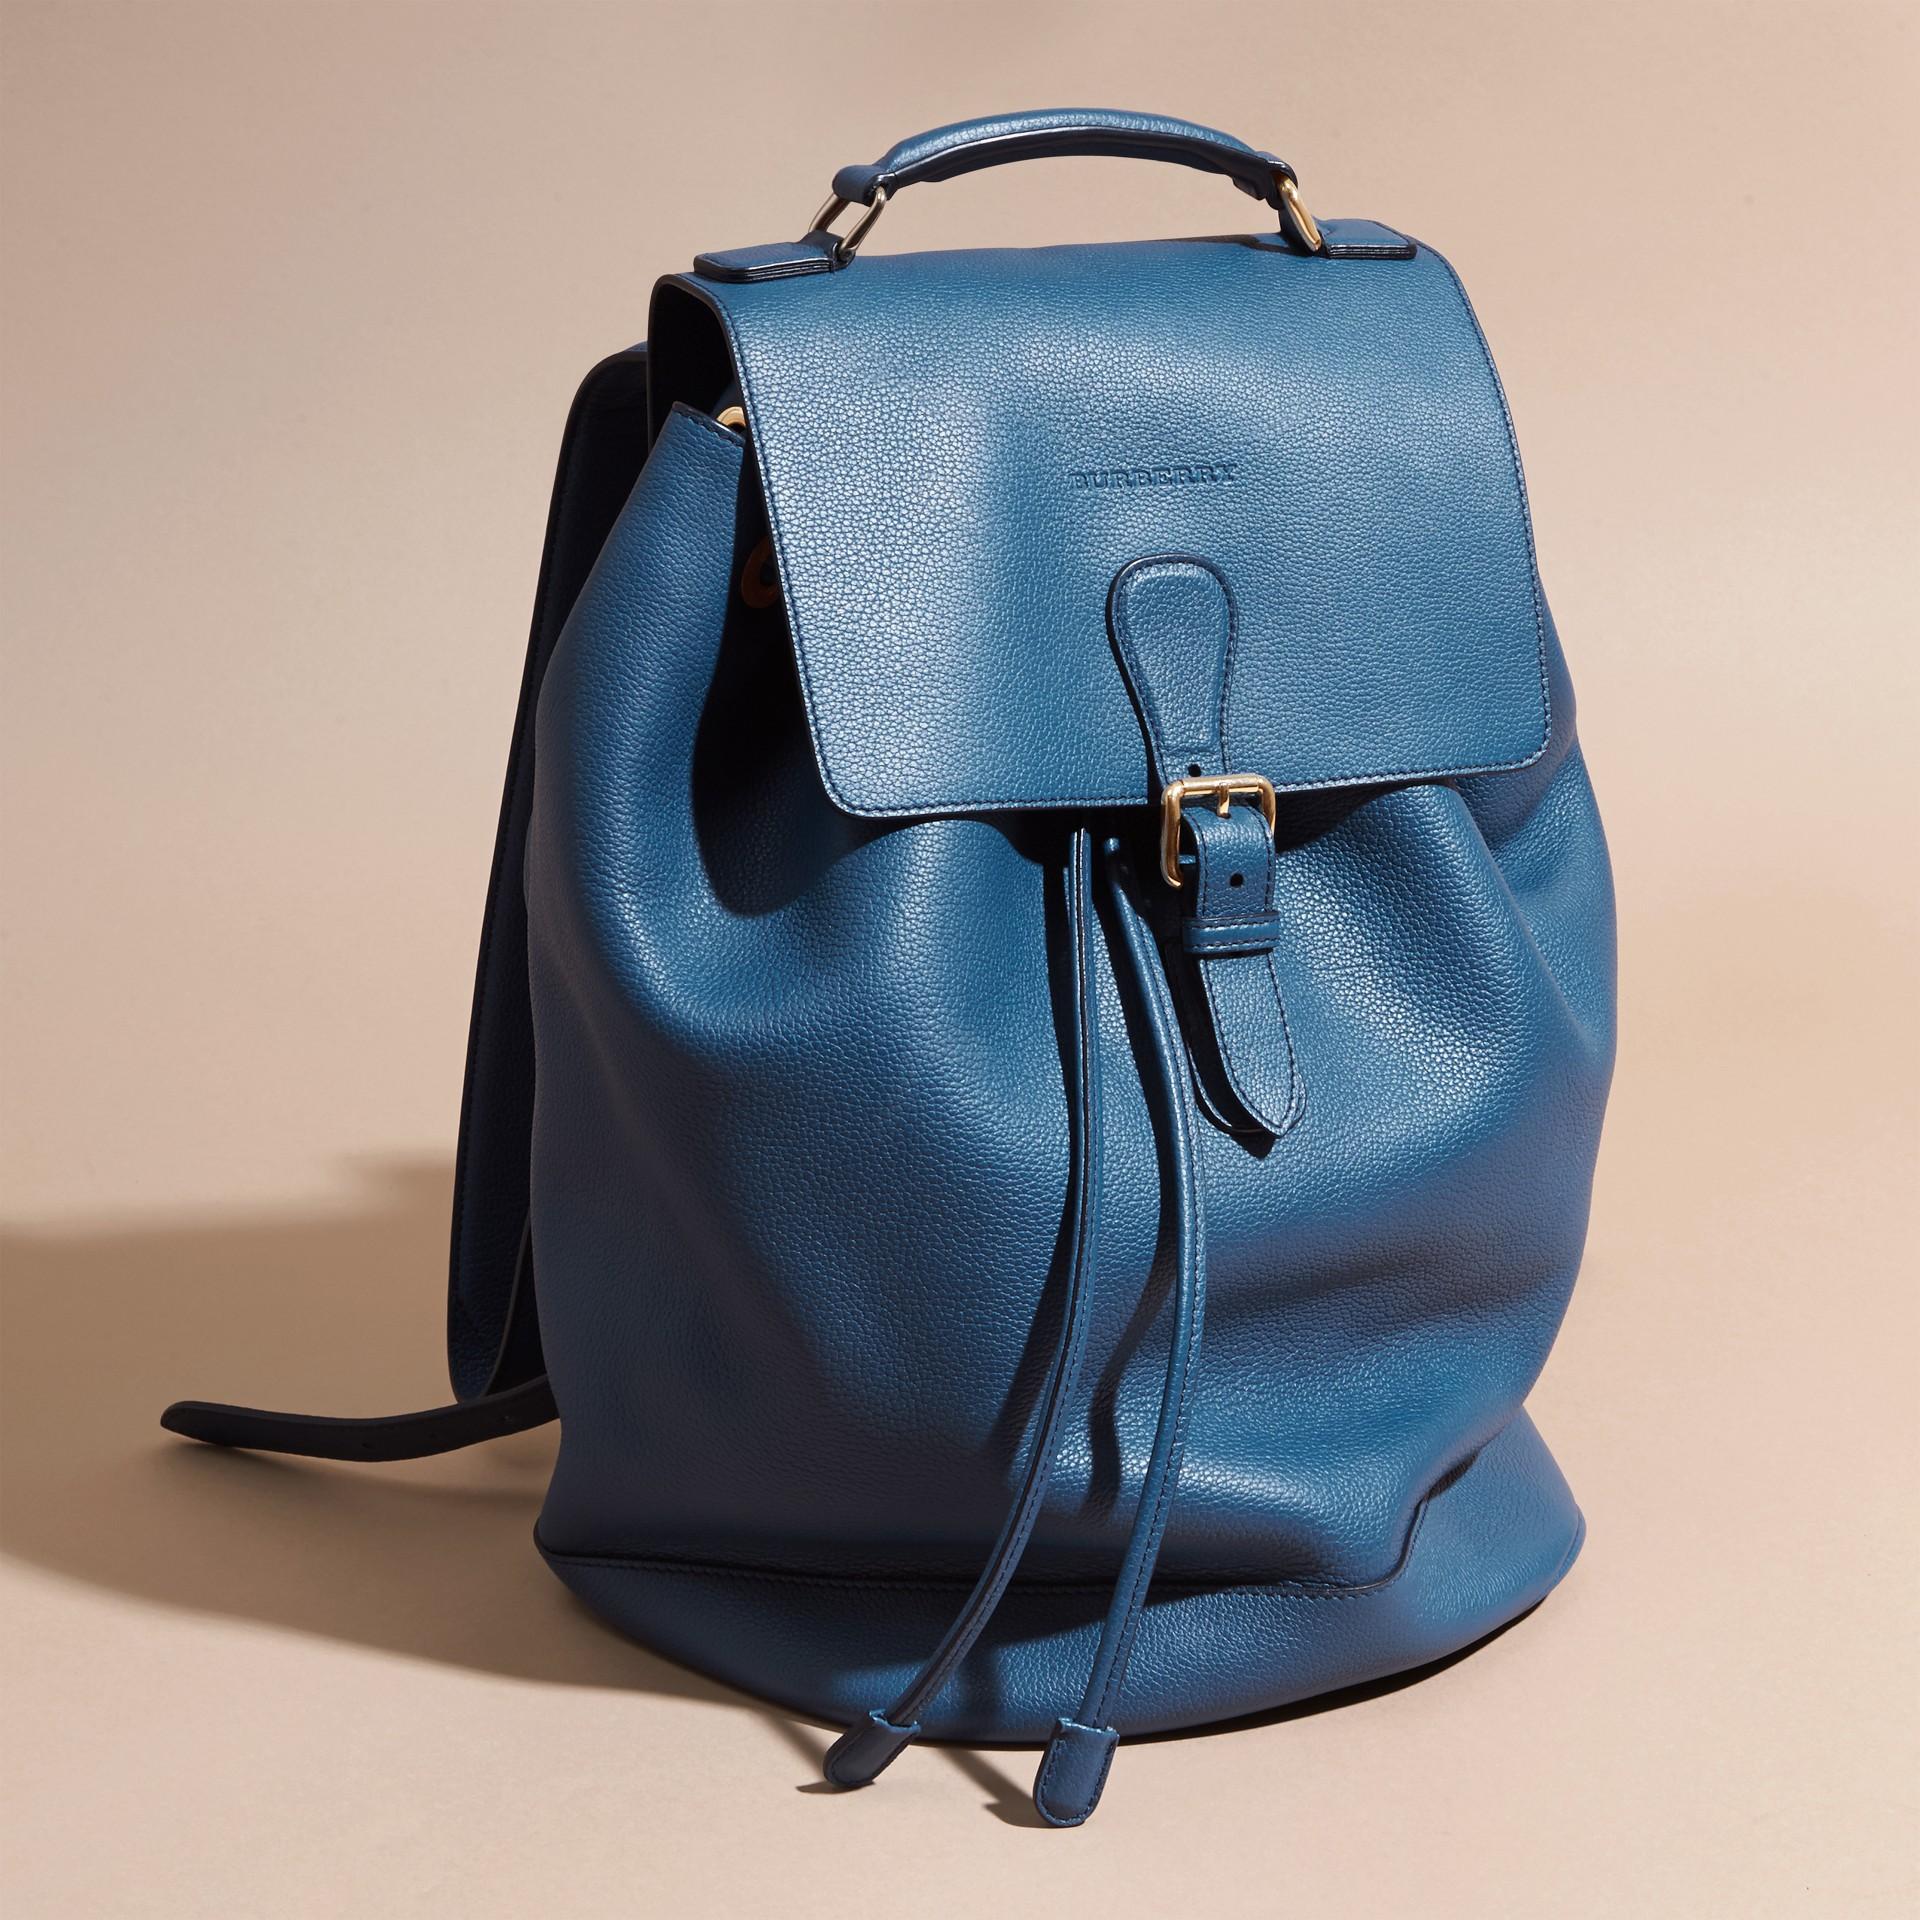 Mineralblau Rucksack aus genarbtem Leder Mineralblau - Galerie-Bild 8